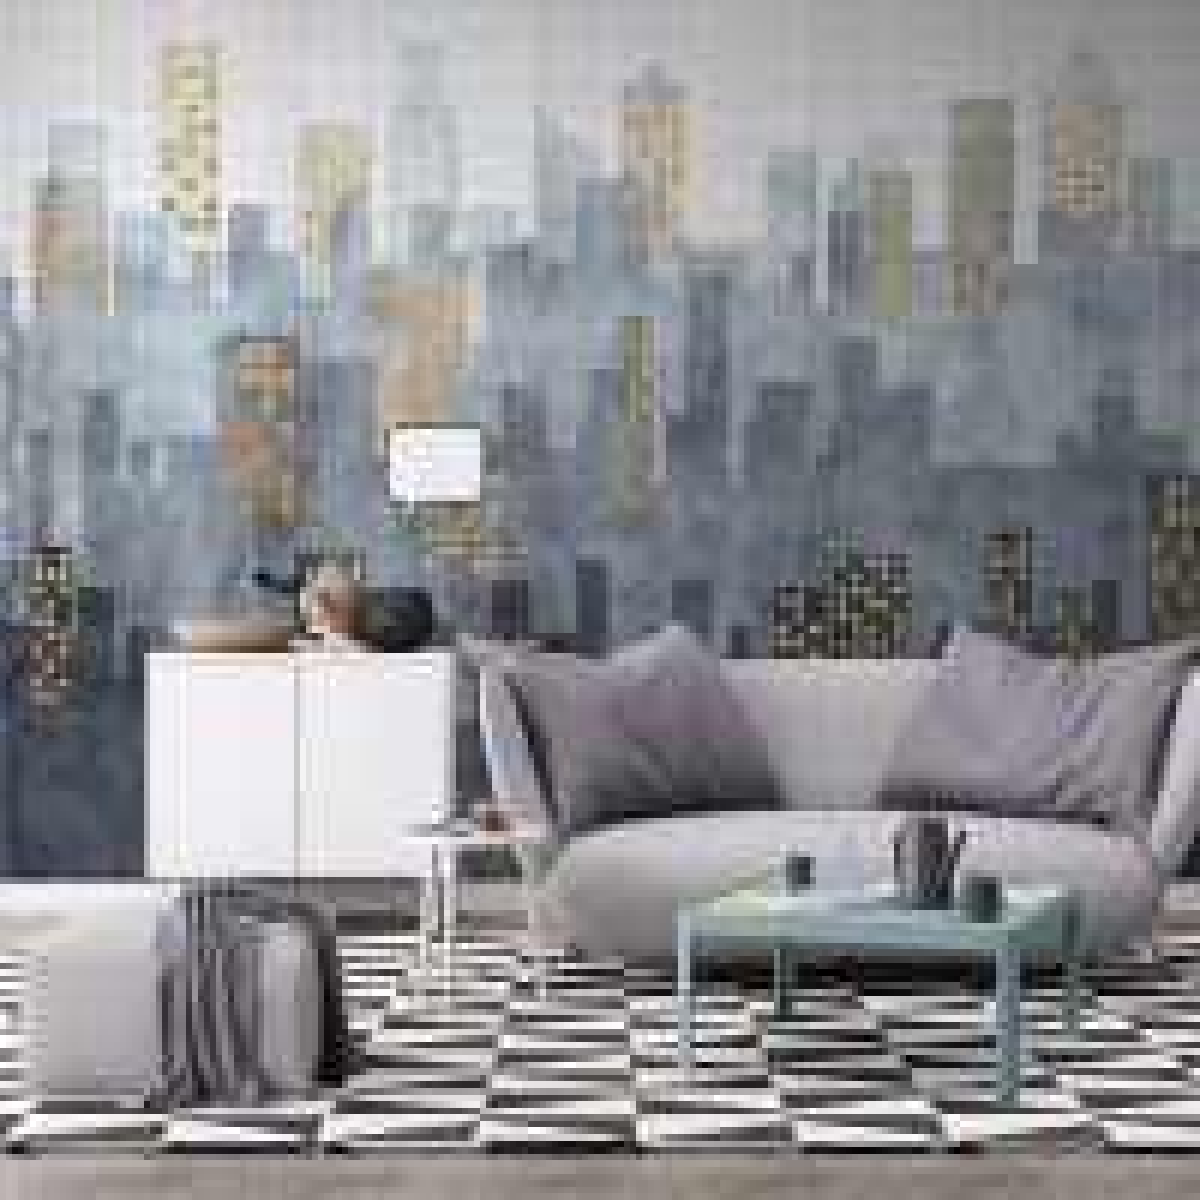 City Silhouette Wallpaper Mural